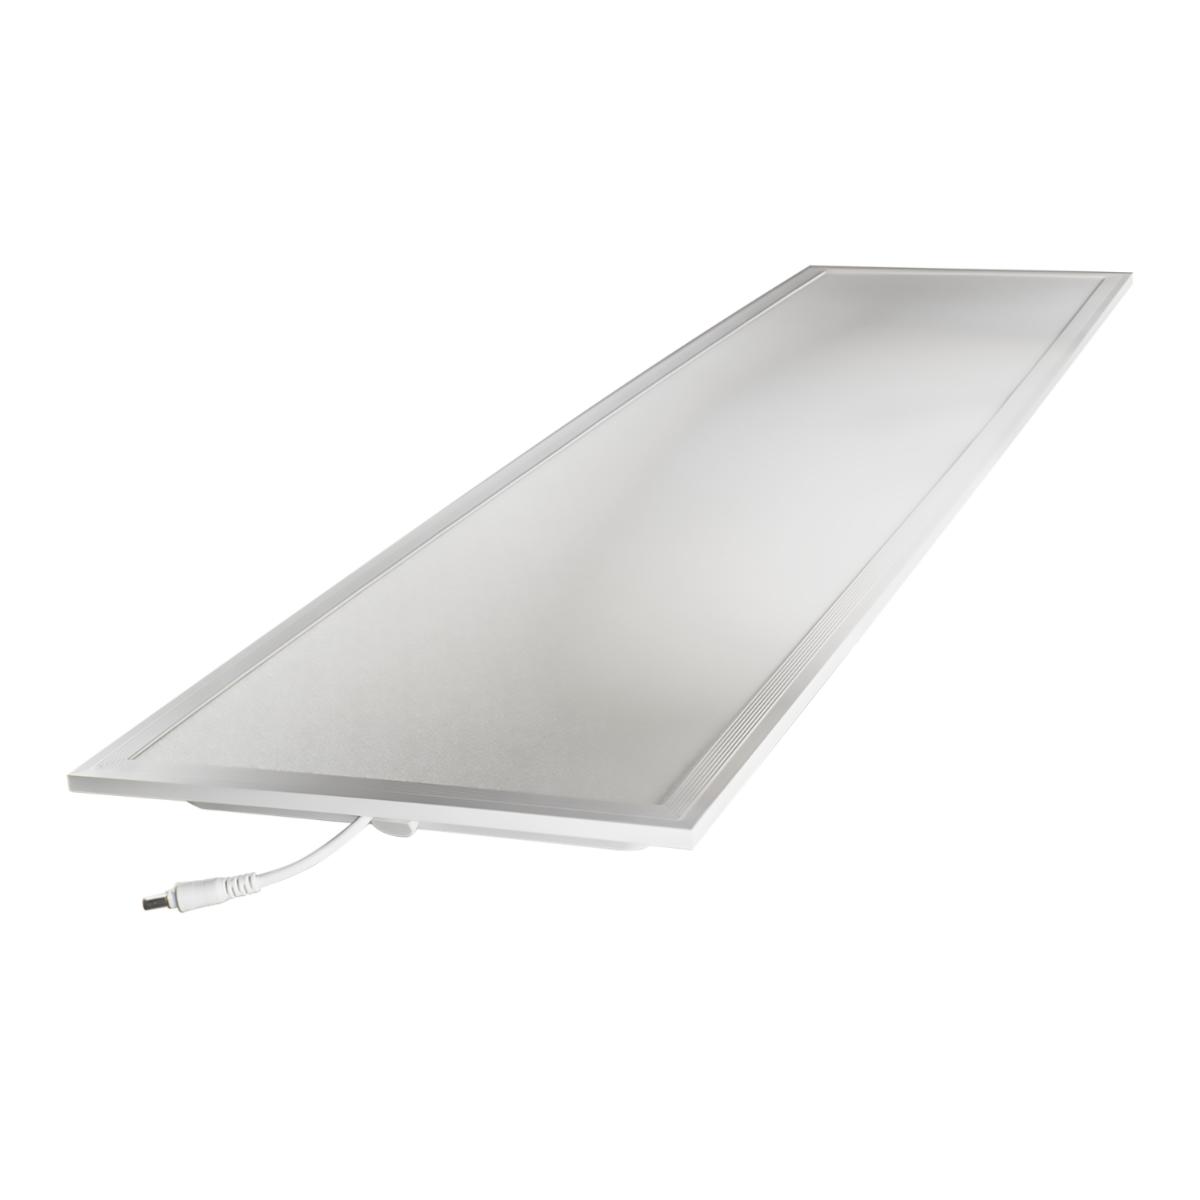 Noxion LED panel Delta Pro V2.0 Xitanium DALI 30W 30x120cm 6500K 4110lm UGR <19 | Dali dimbar - daglys - erstatter 2x36W